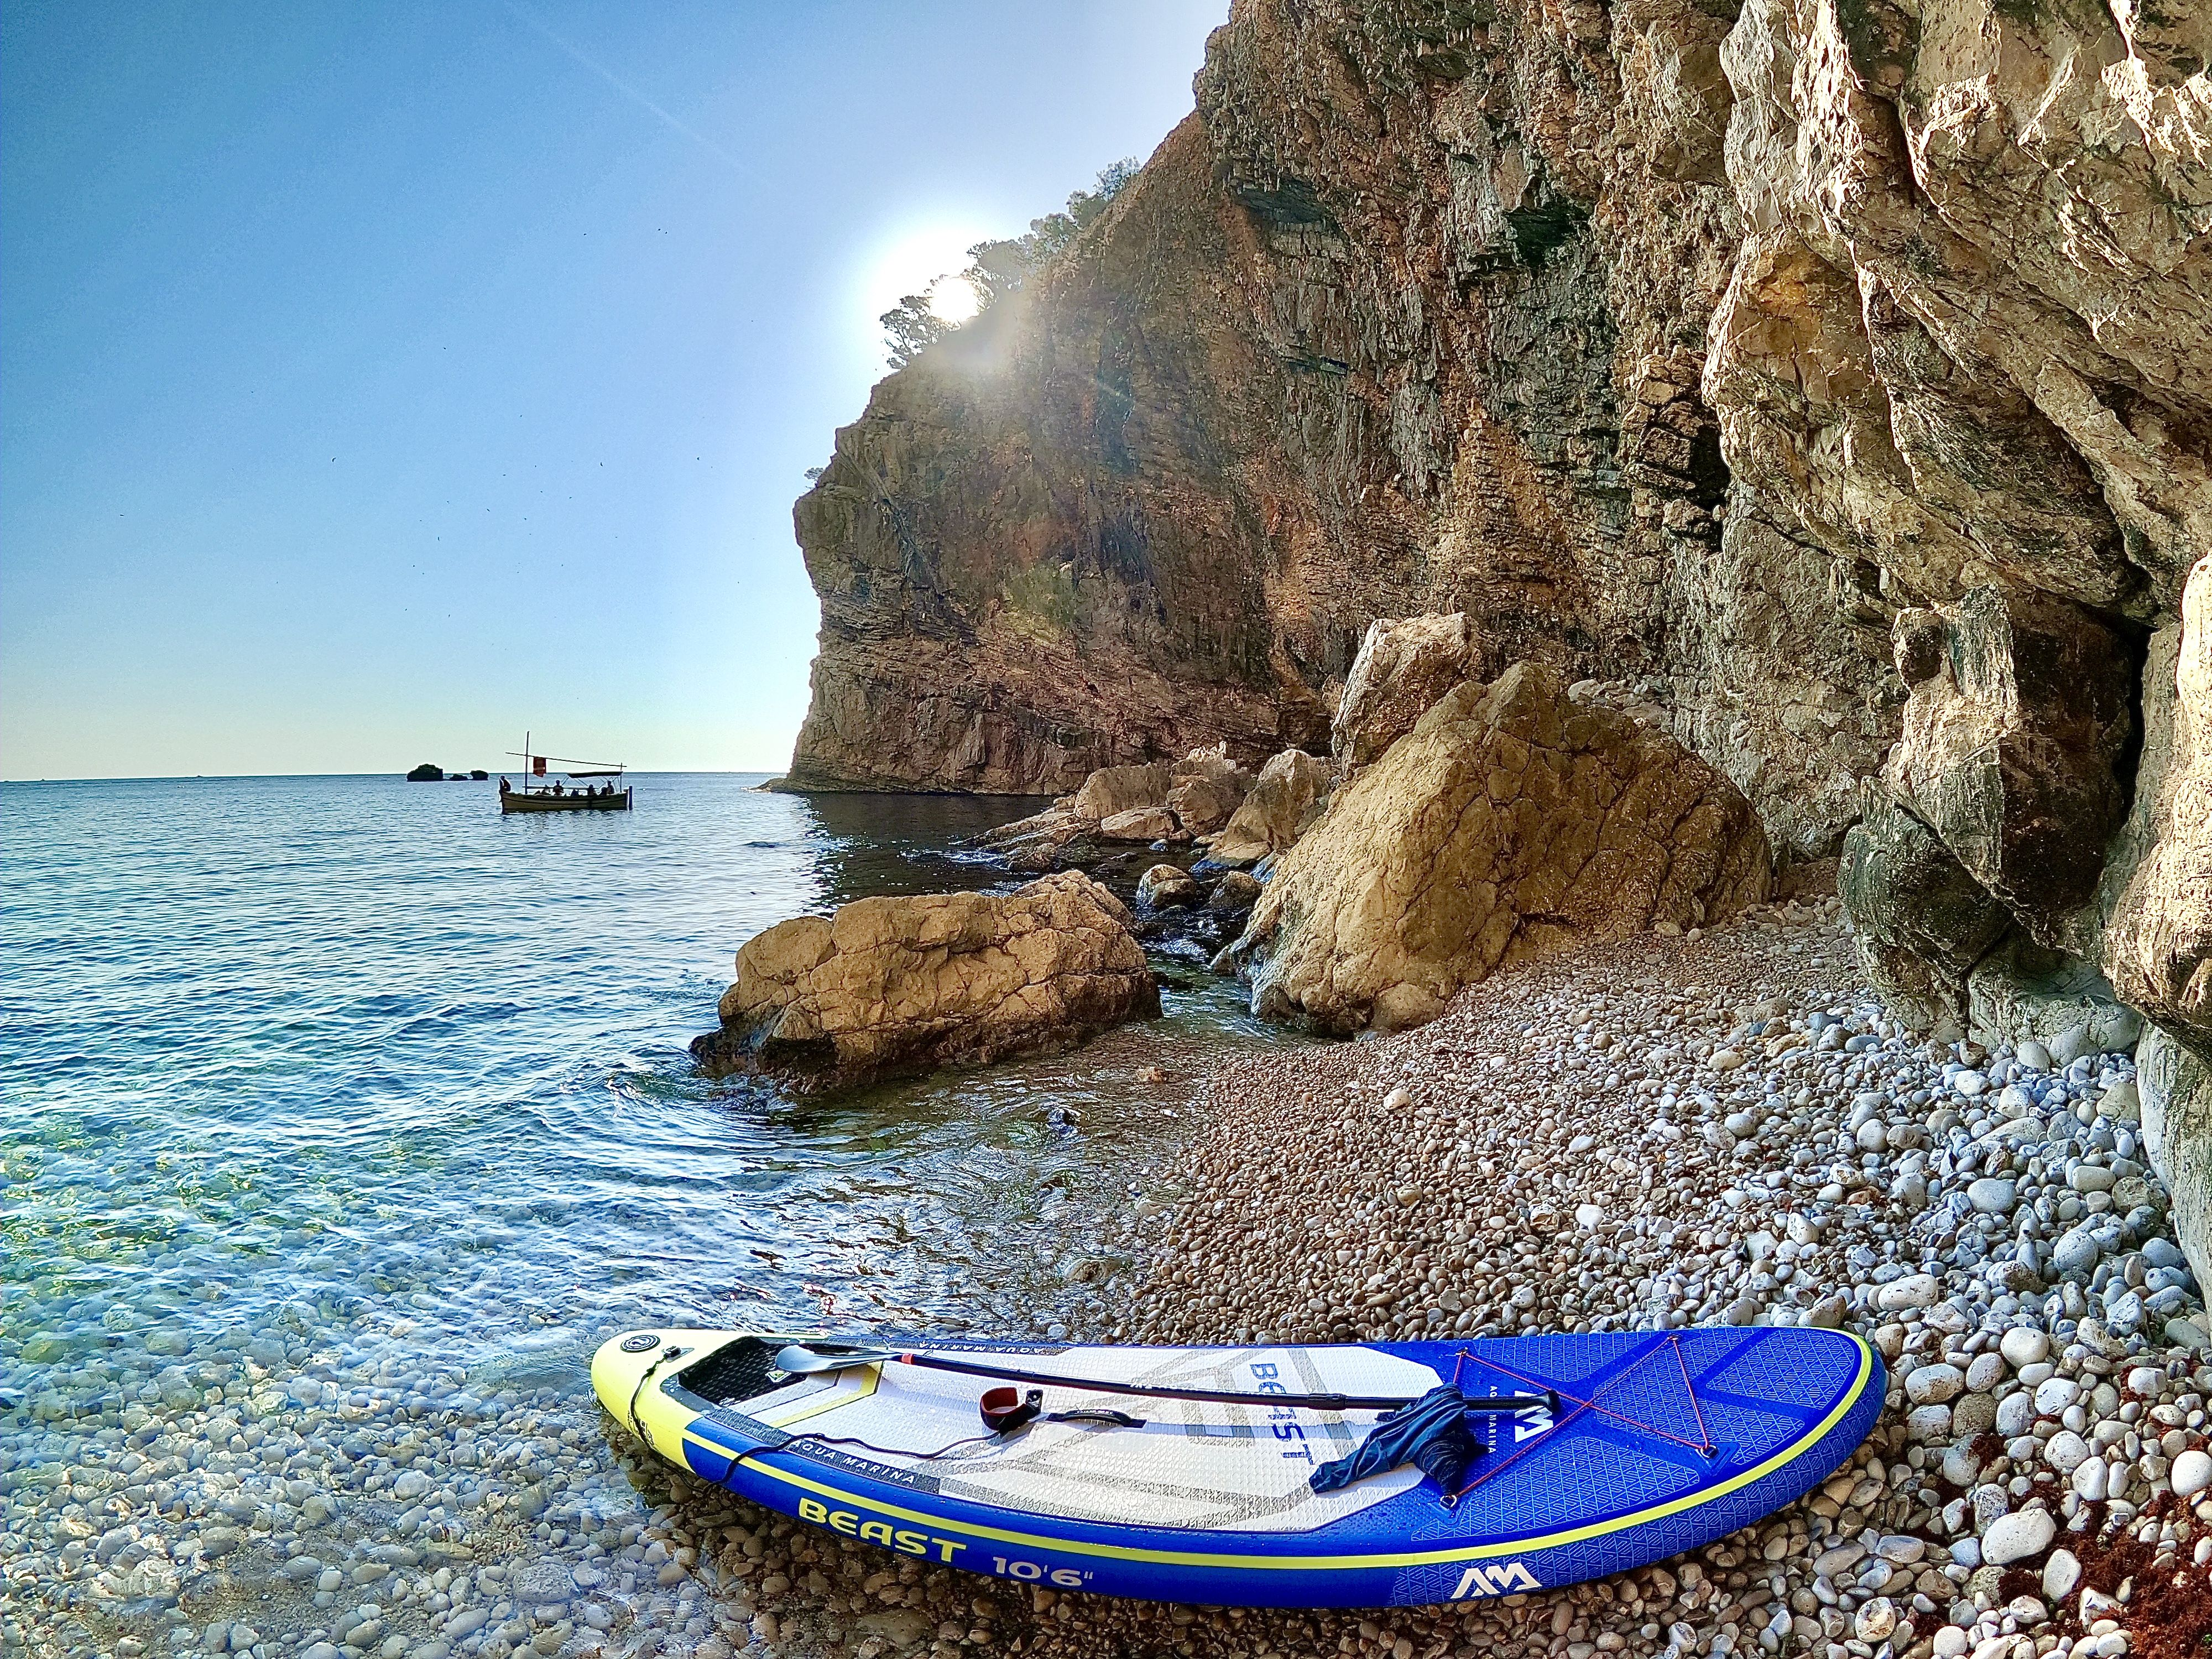 La recompensa Costa del Montgrí#Jaume Benet Bove 339